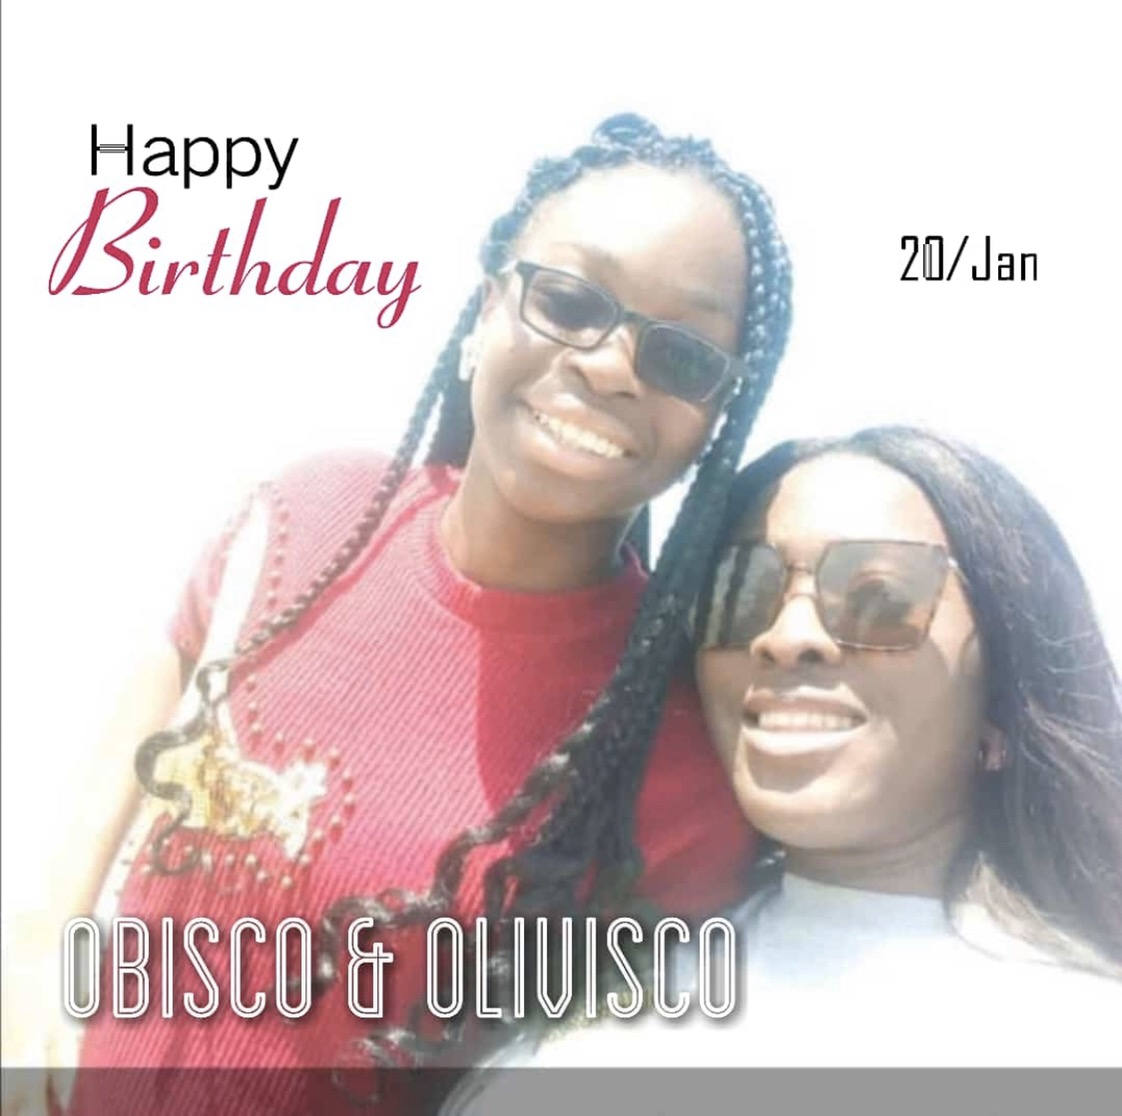 Happy birthday to my girlssss